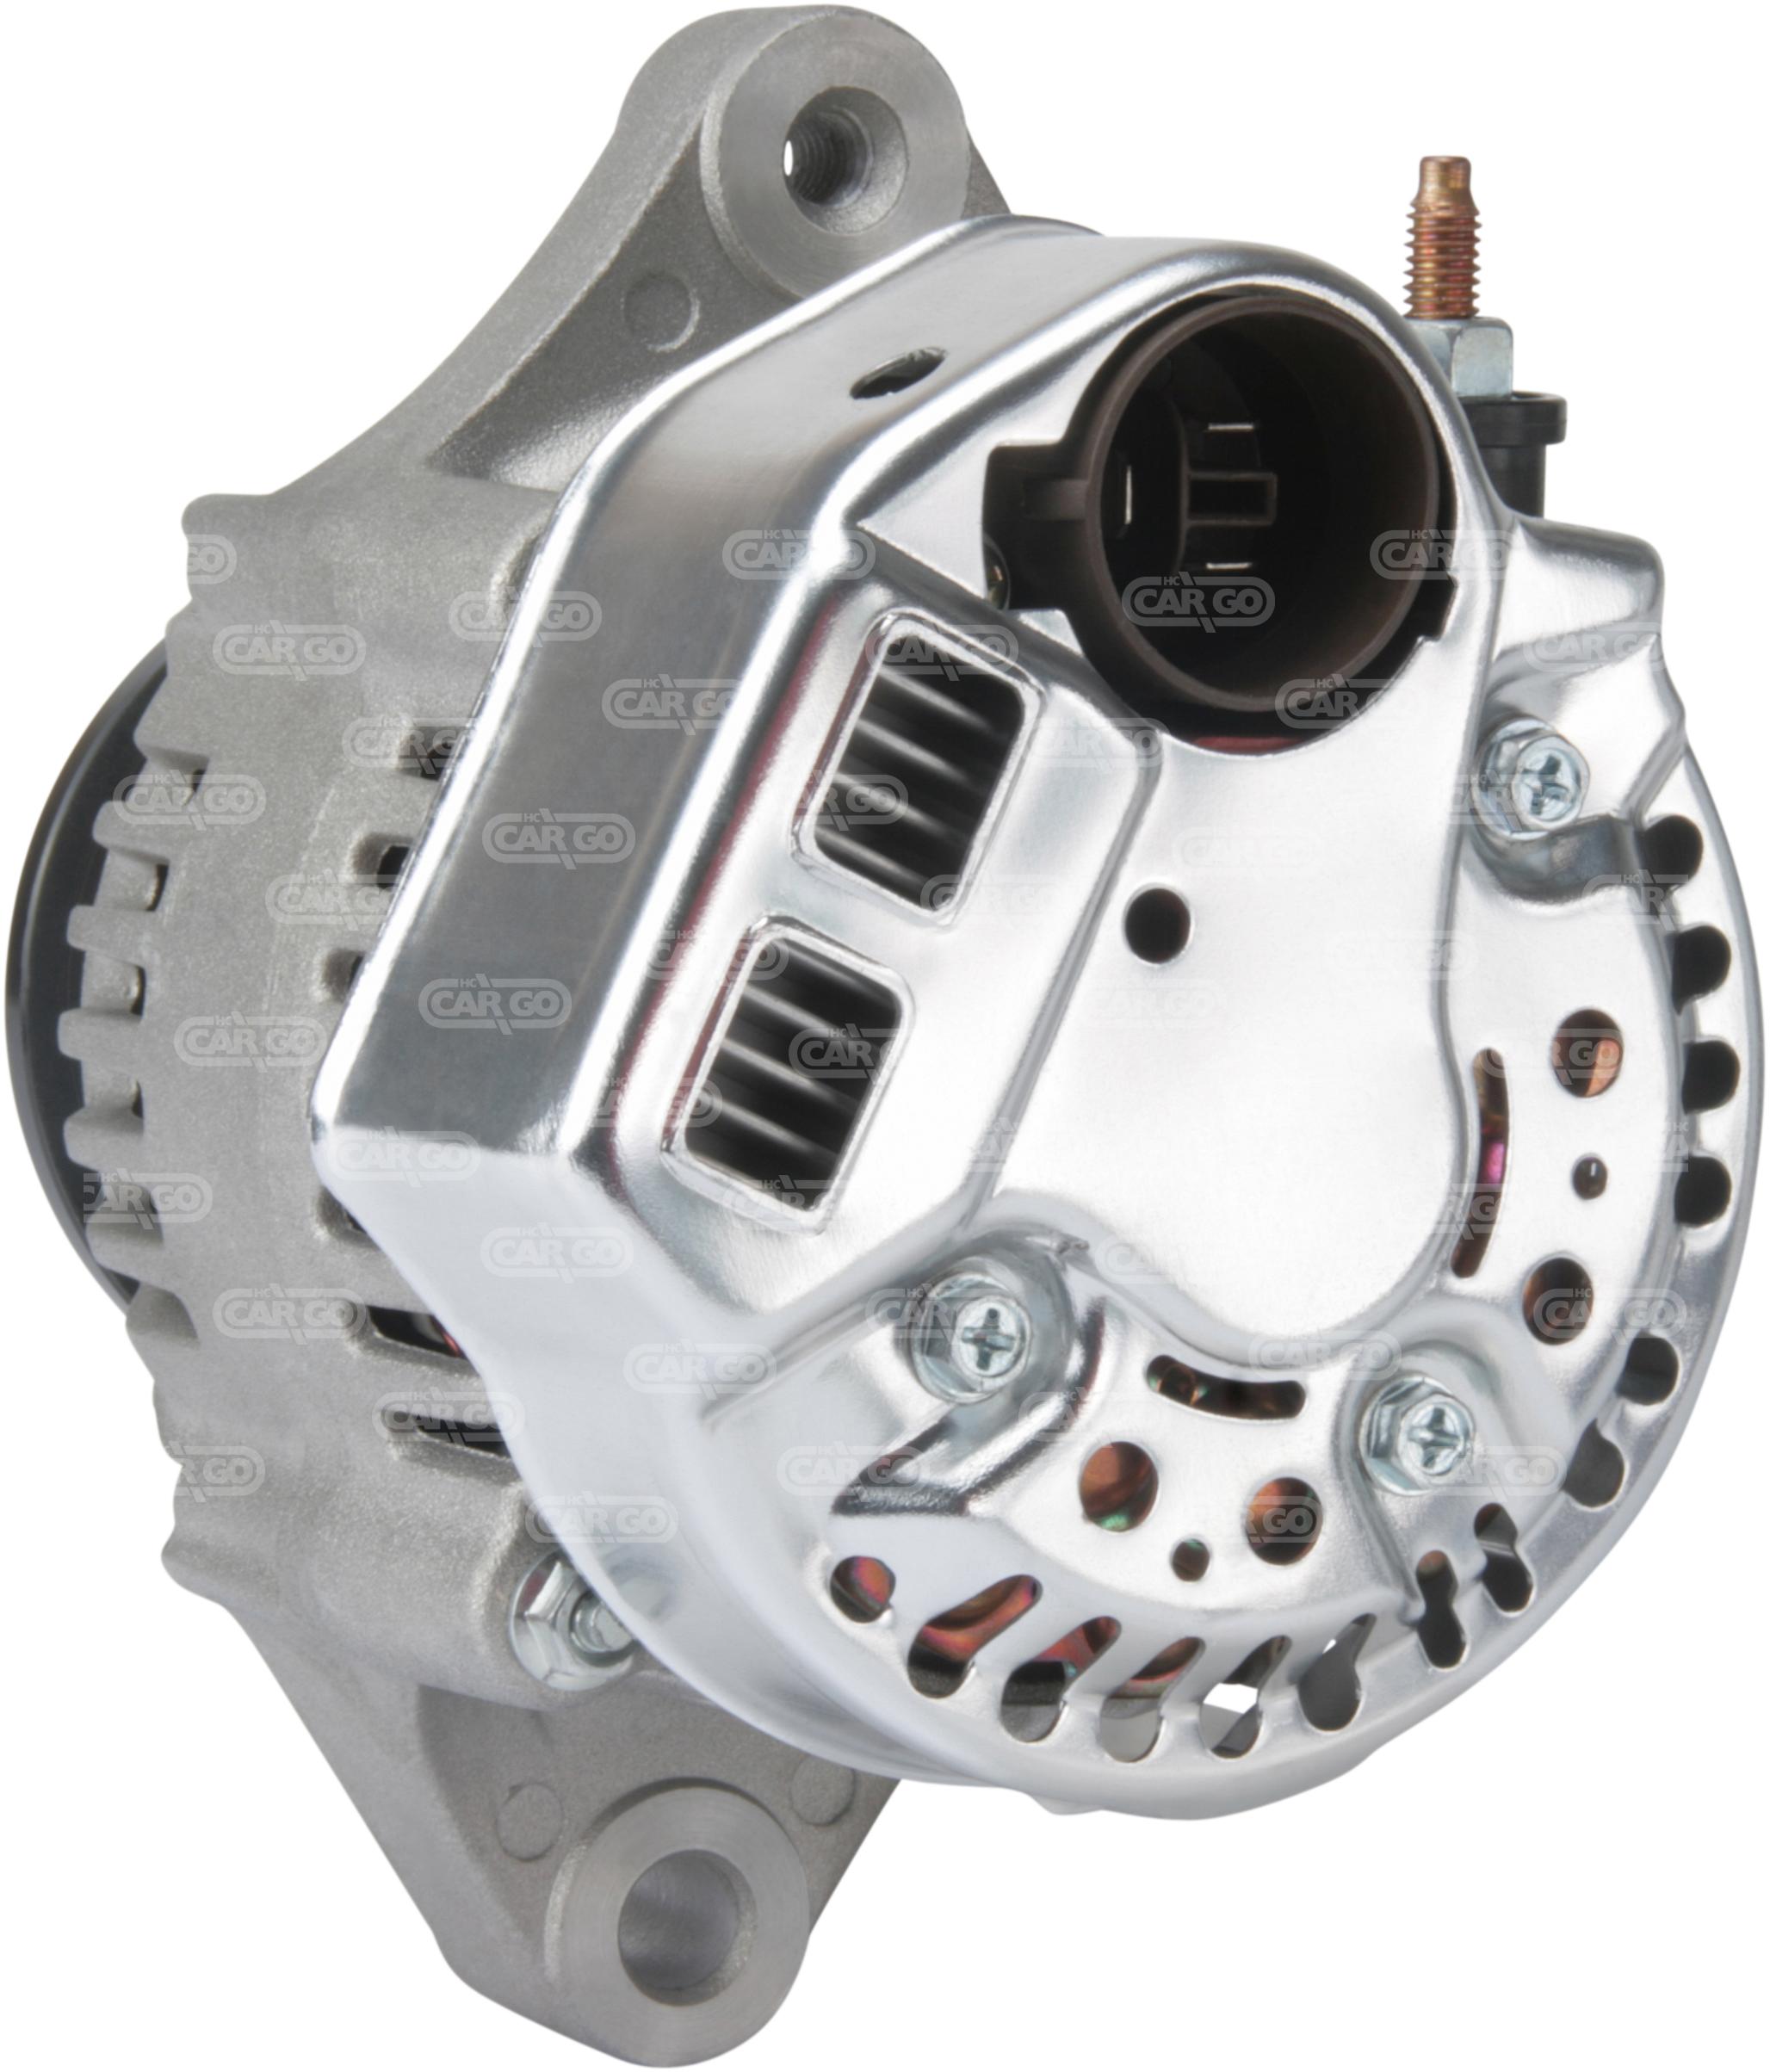 Alternateur 679 Voltage14 Amp35